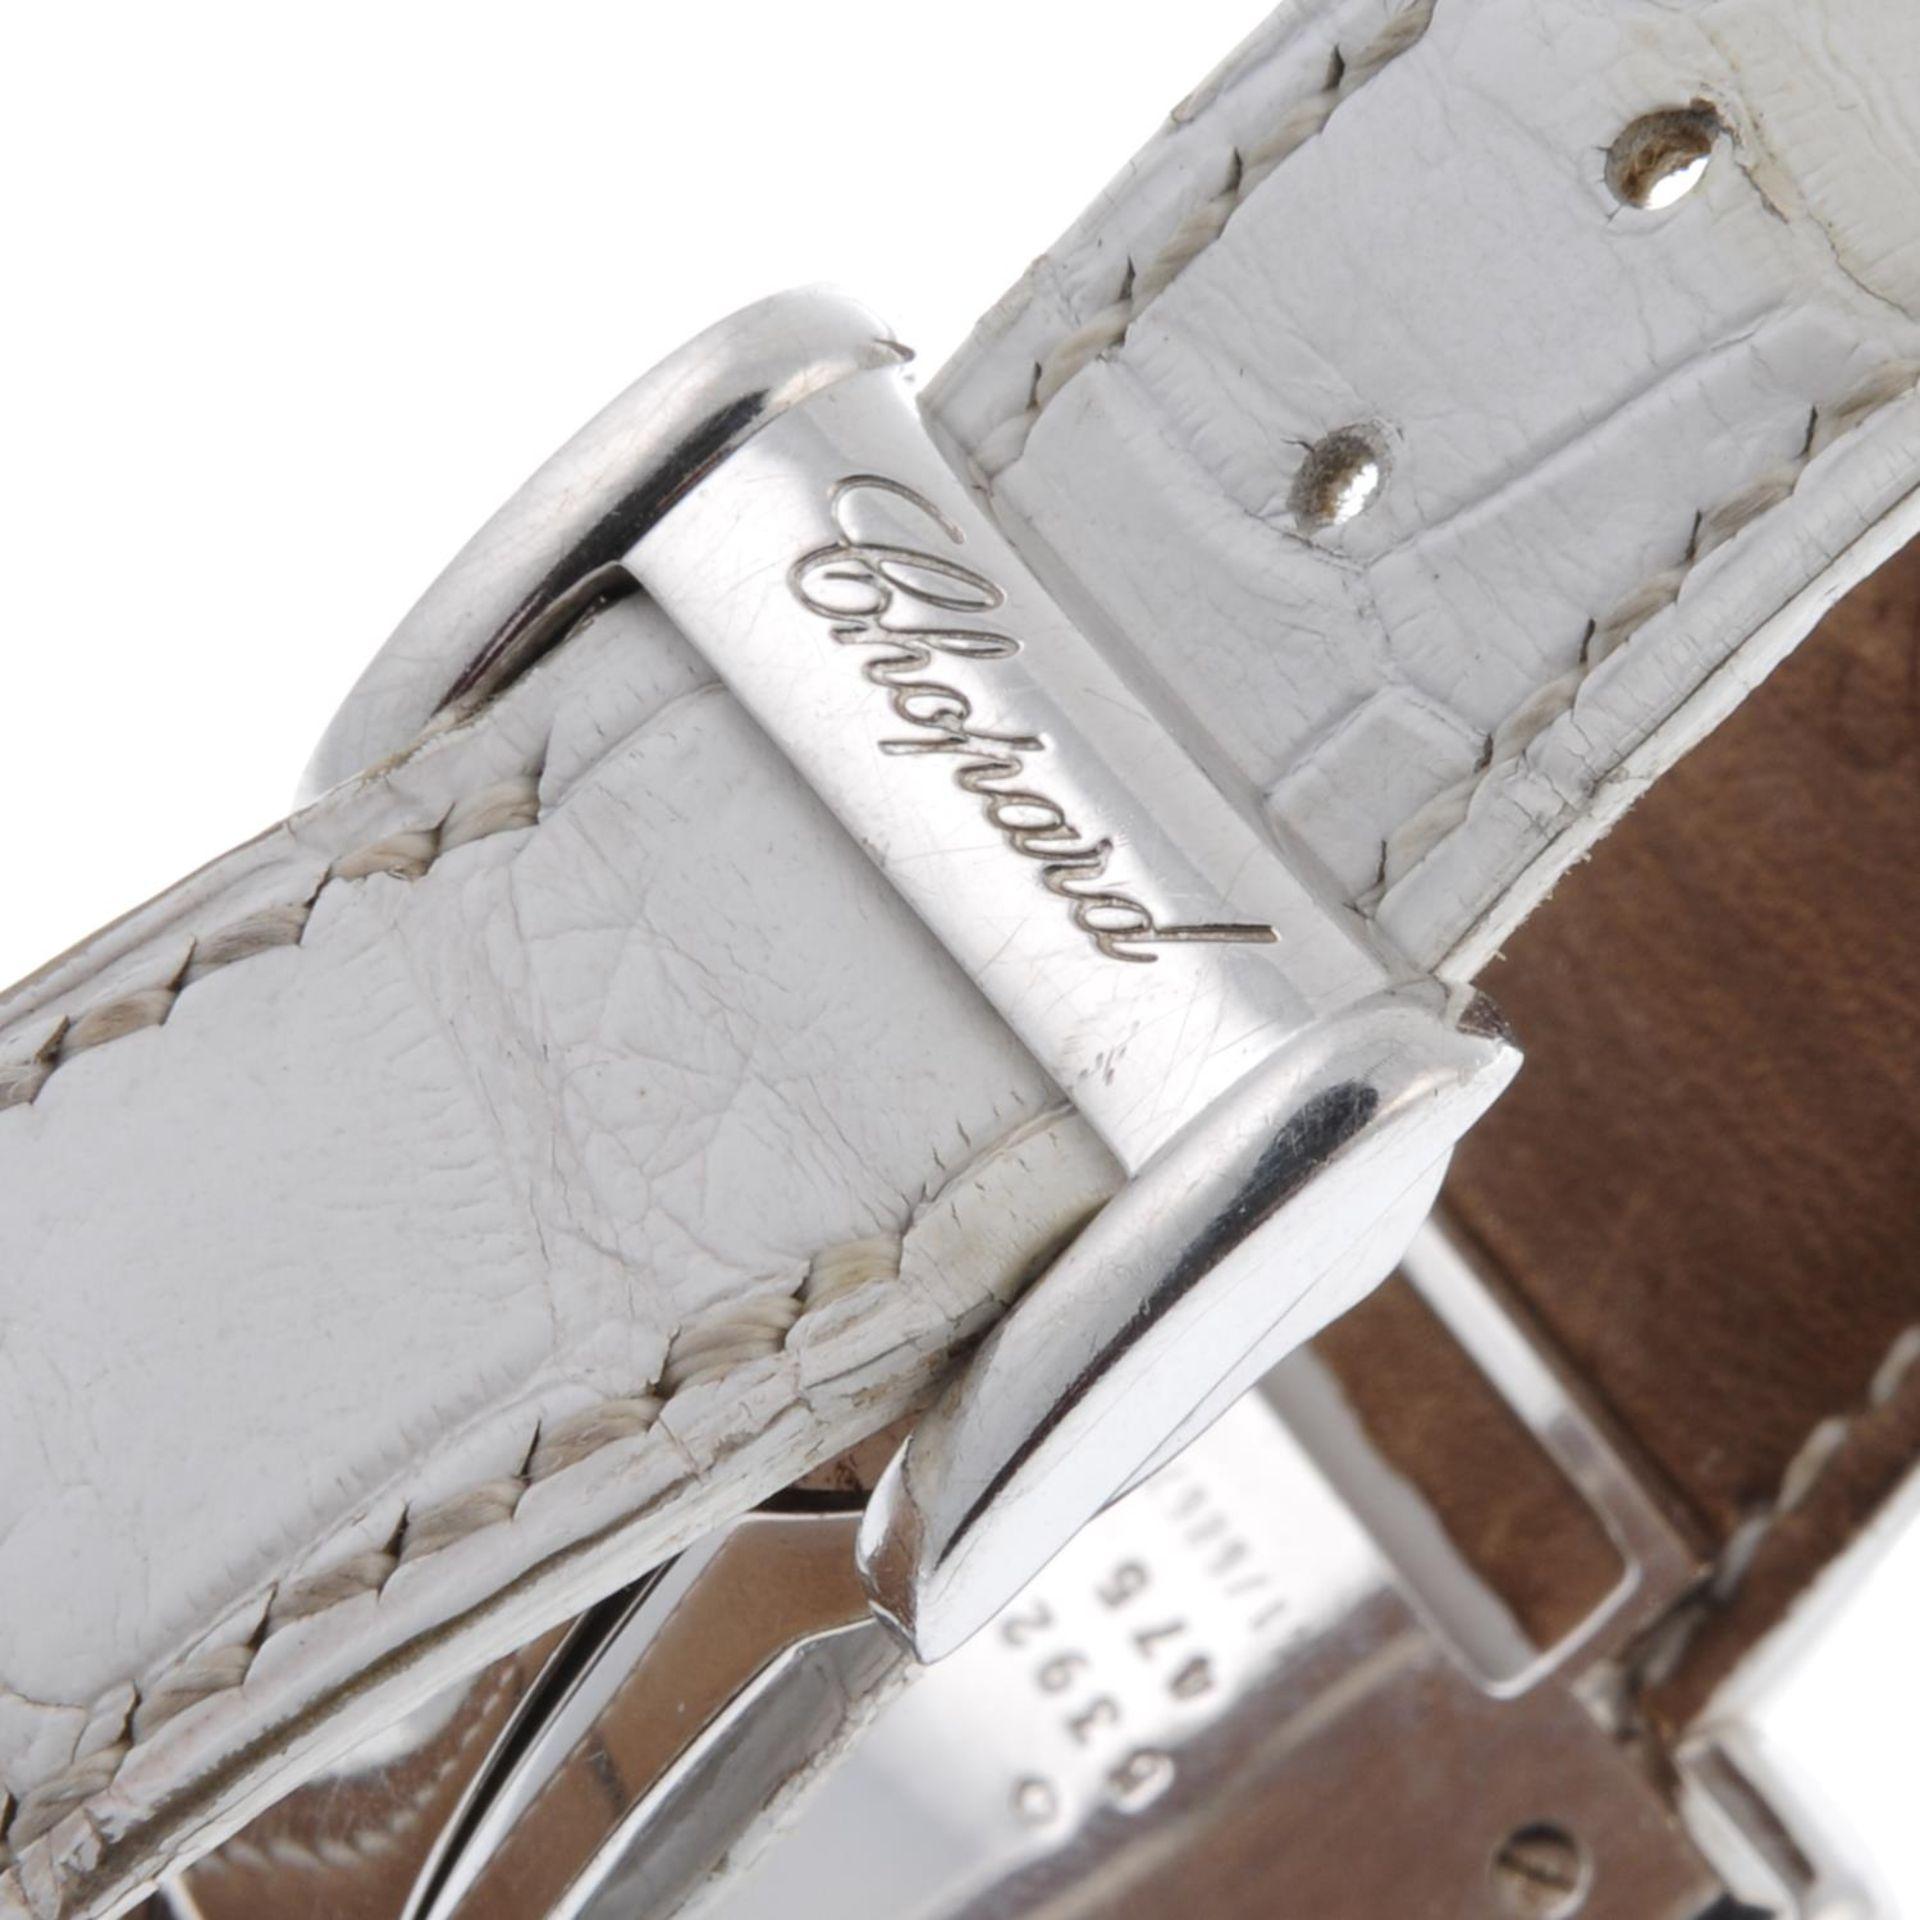 CHOPARD - a La Strada wrist watch. - Bild 2 aus 5